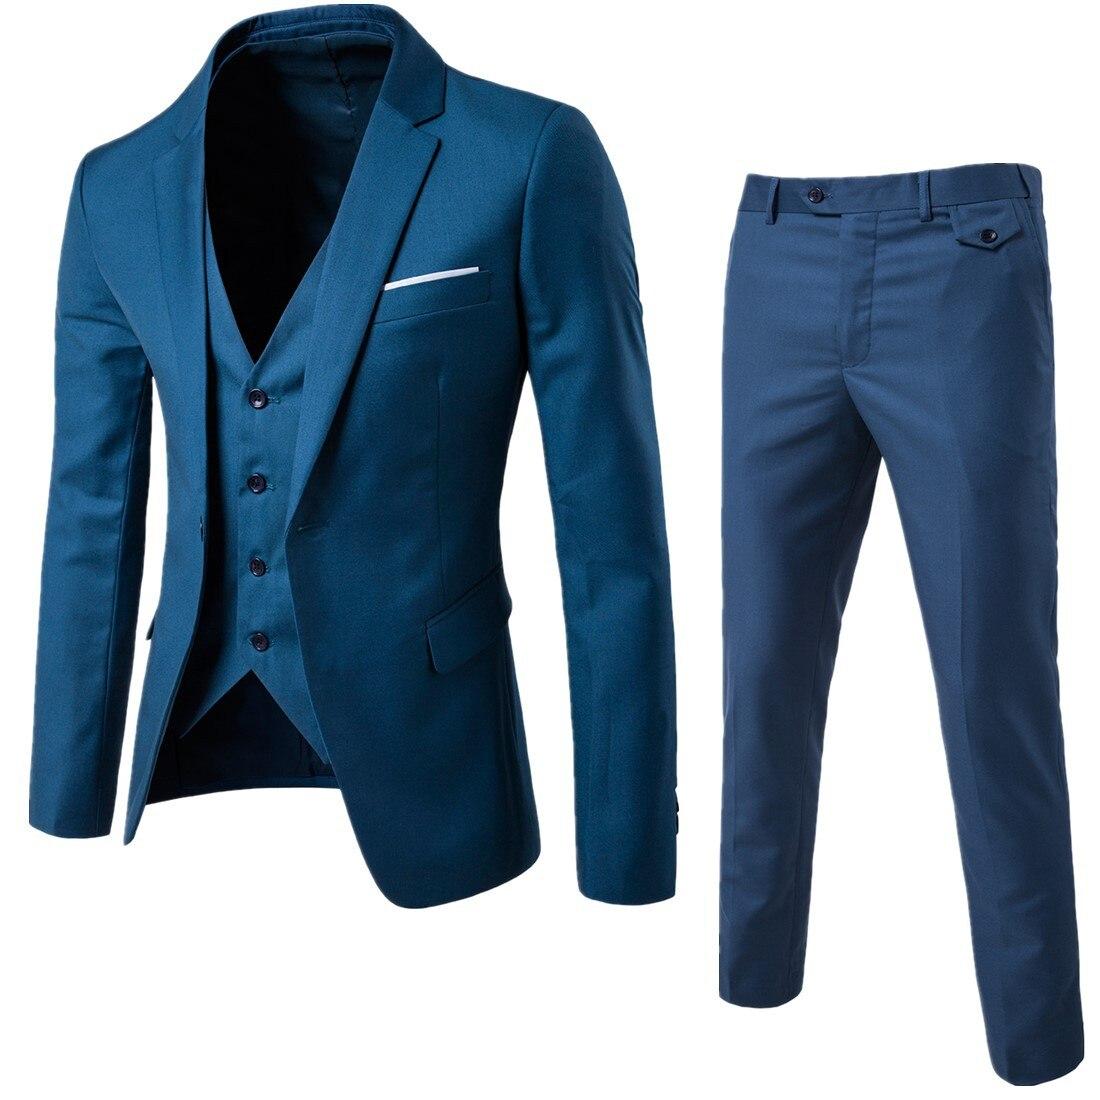 Suit Set Men Three-piece Set Business Formal Wear Suit Korean-style Slim Fit Best Man Groom Marriage Formal Dress Autumn